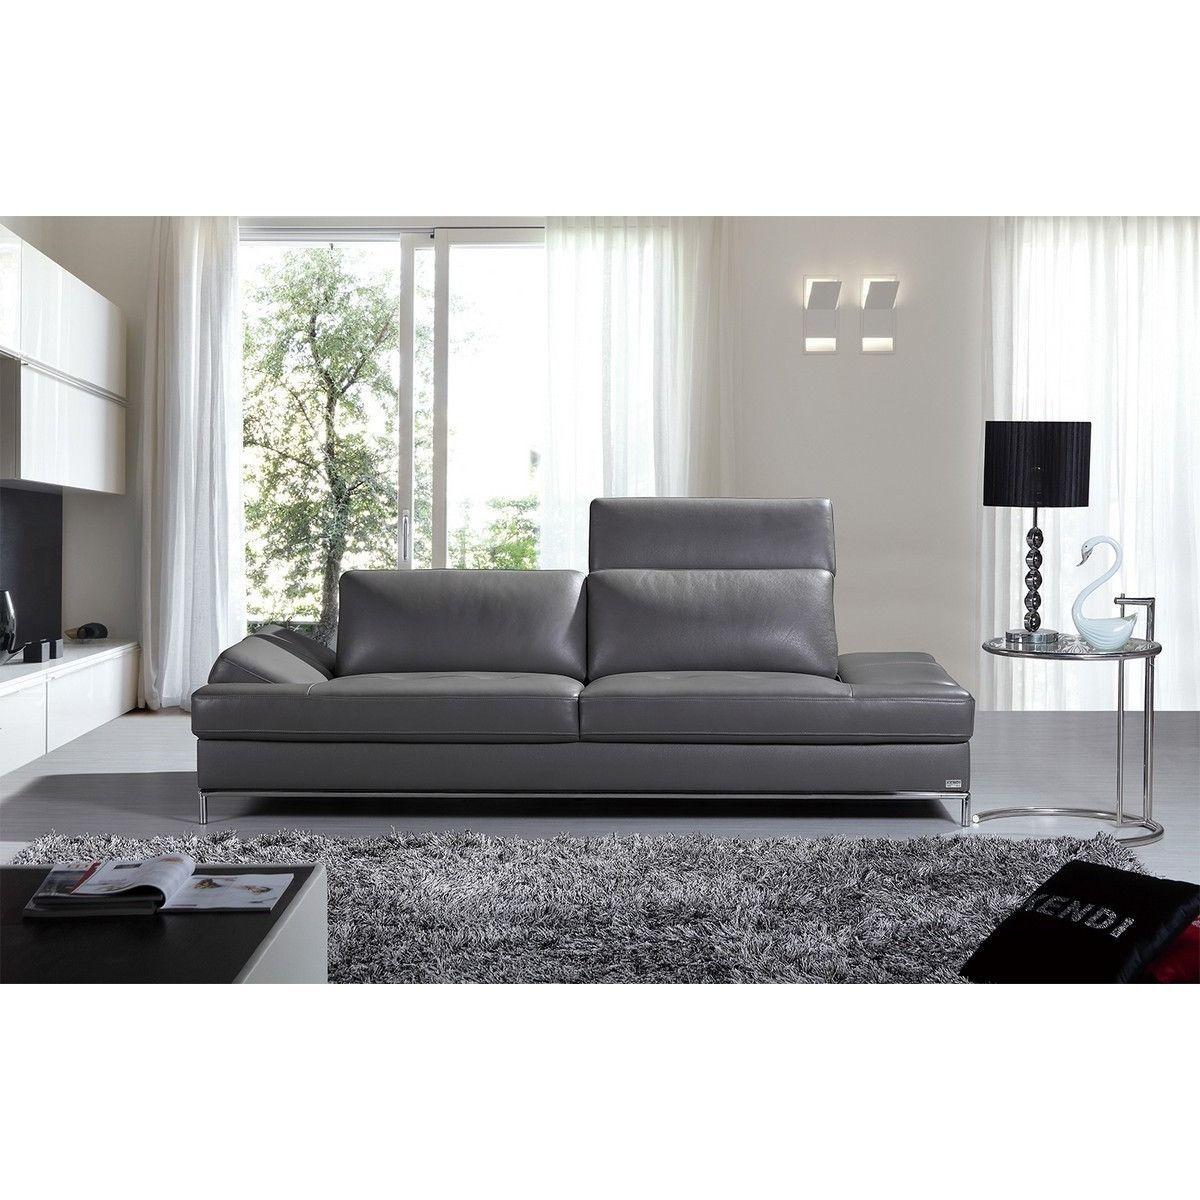 Divani casa izzy modern dark grey ecoleather sofa leather sofas